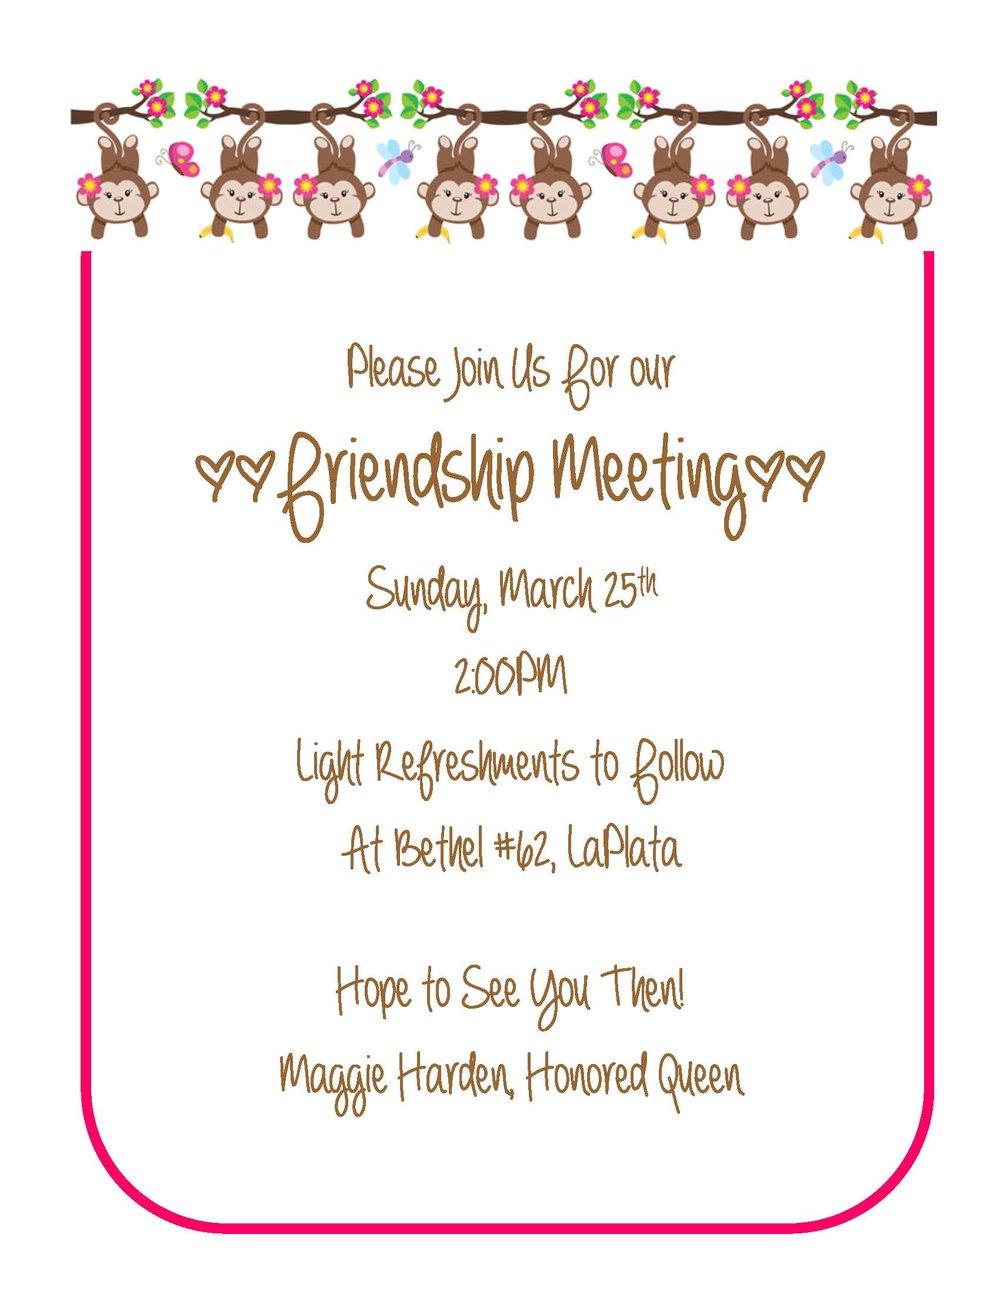 Bethel 62 Friendship Meeting Invite.jpg